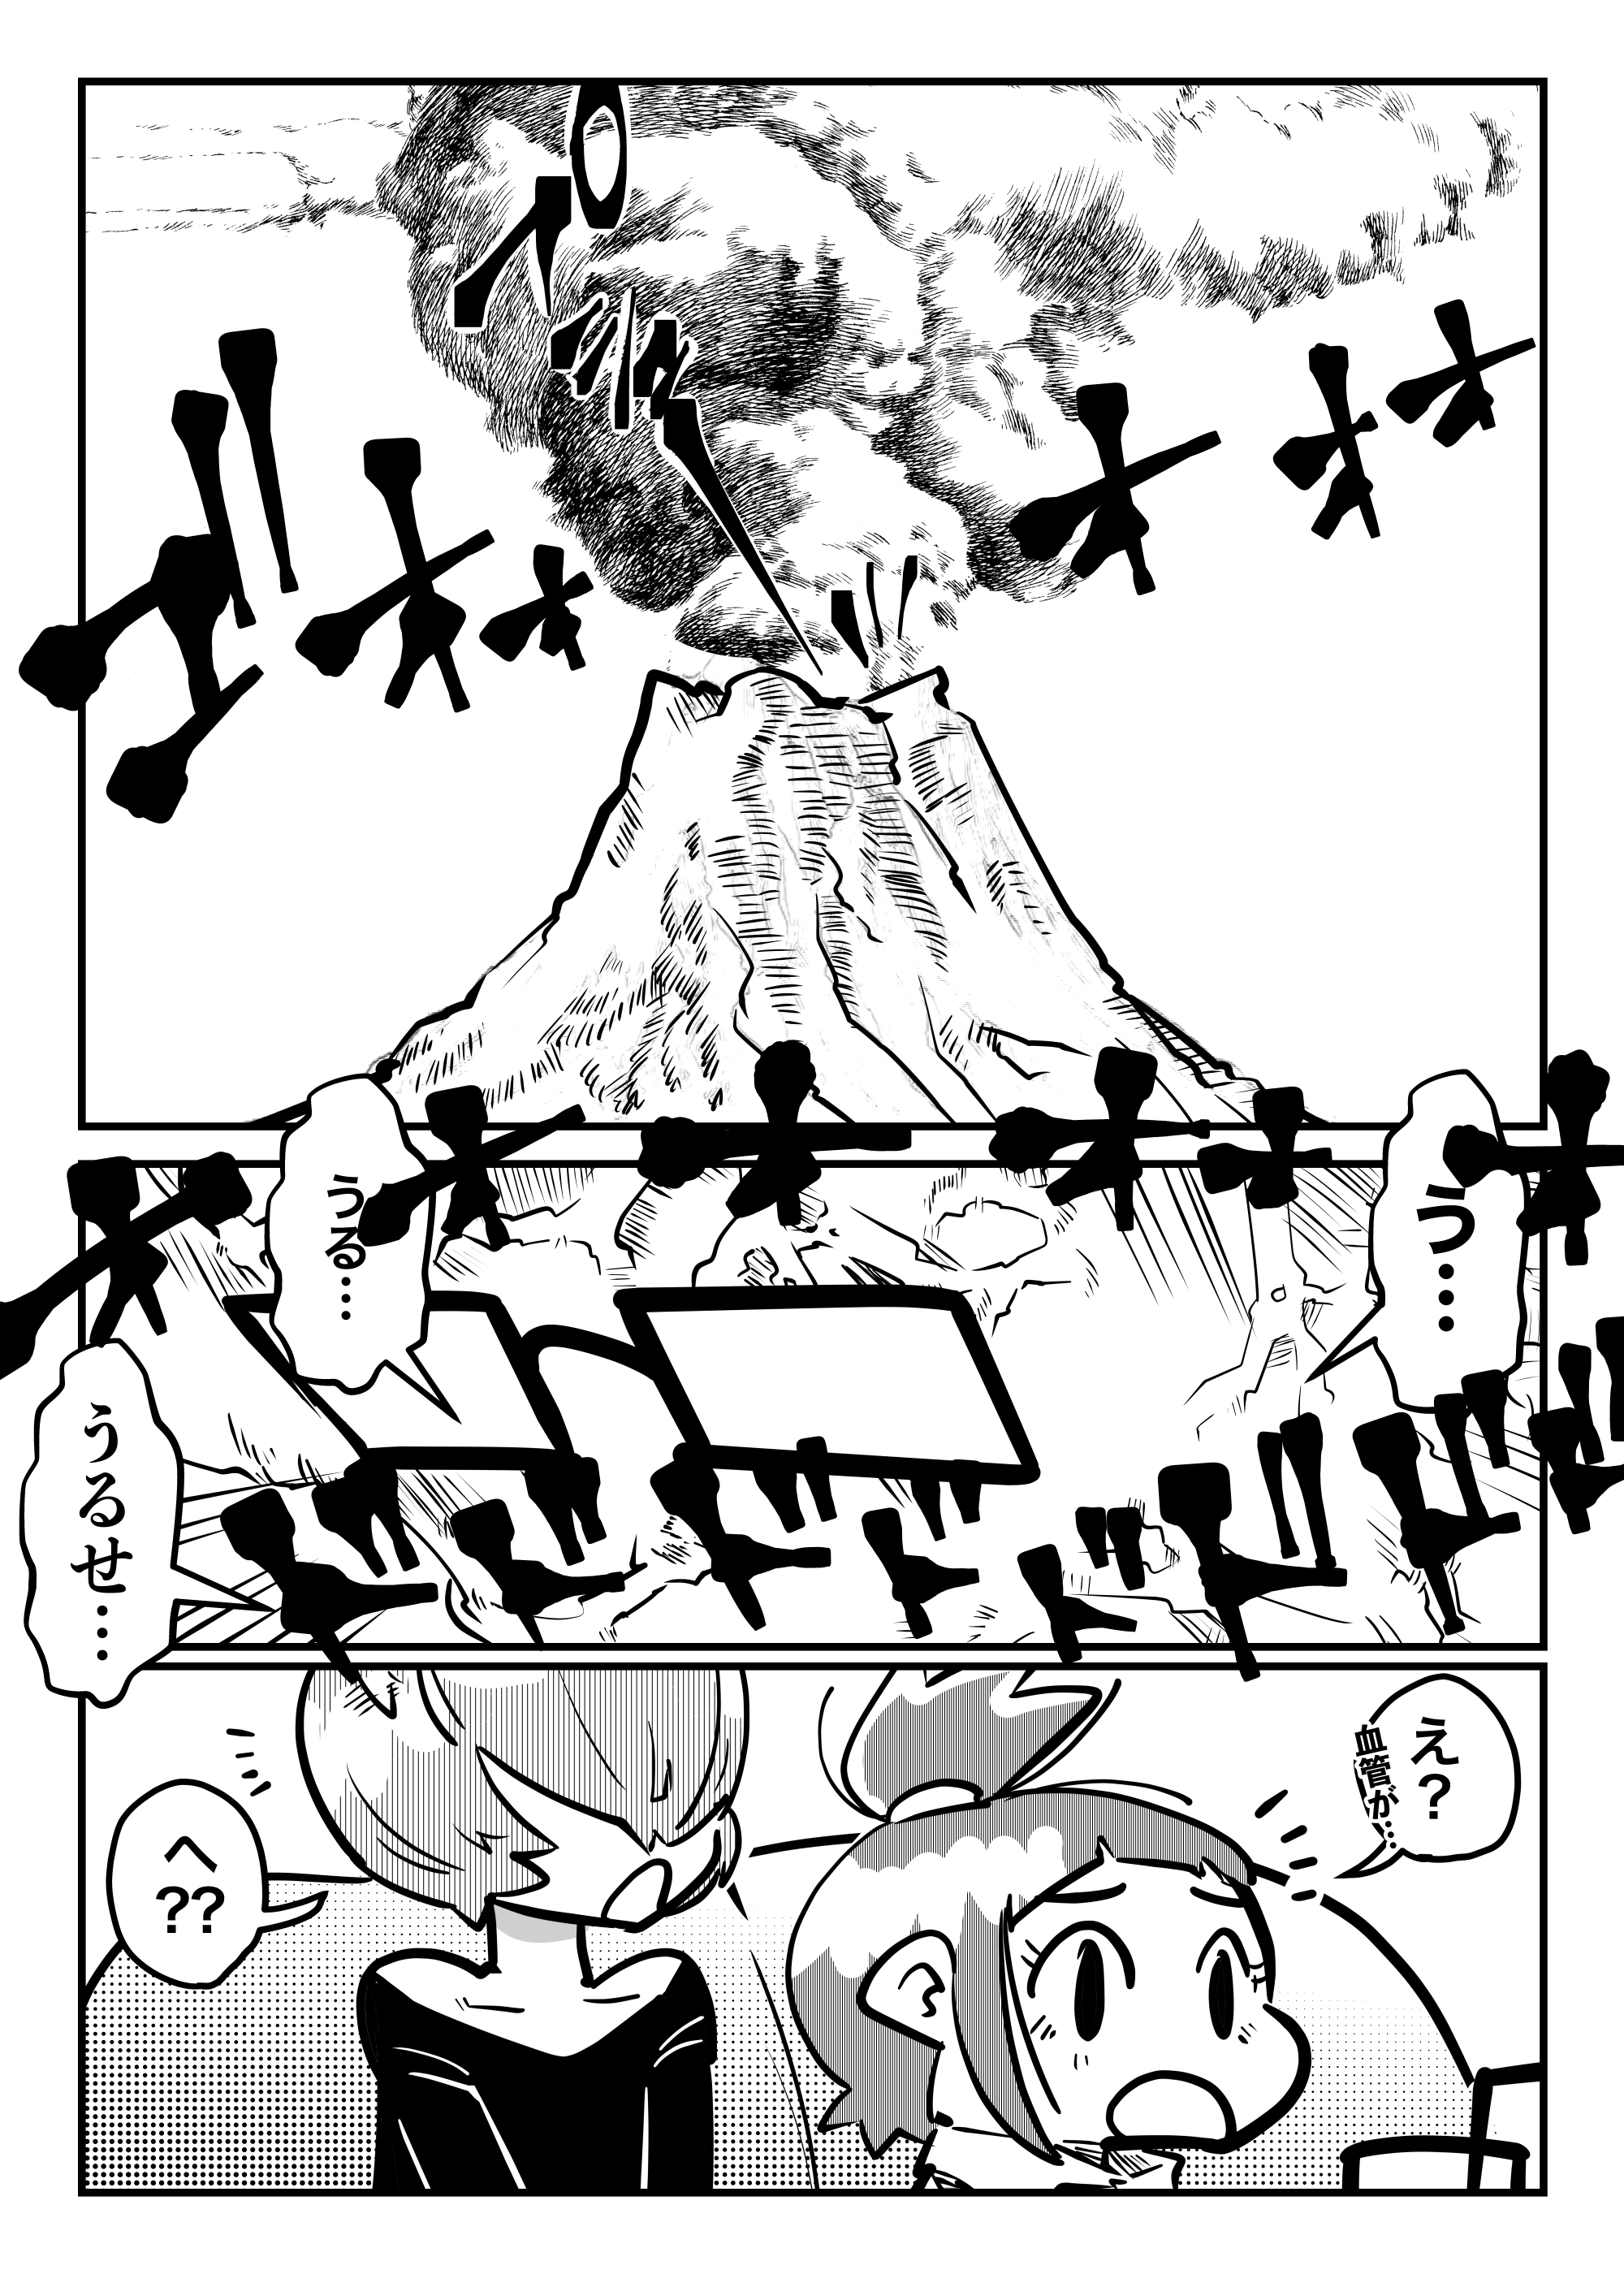 f:id:terashimaru117:20210910051837p:plain